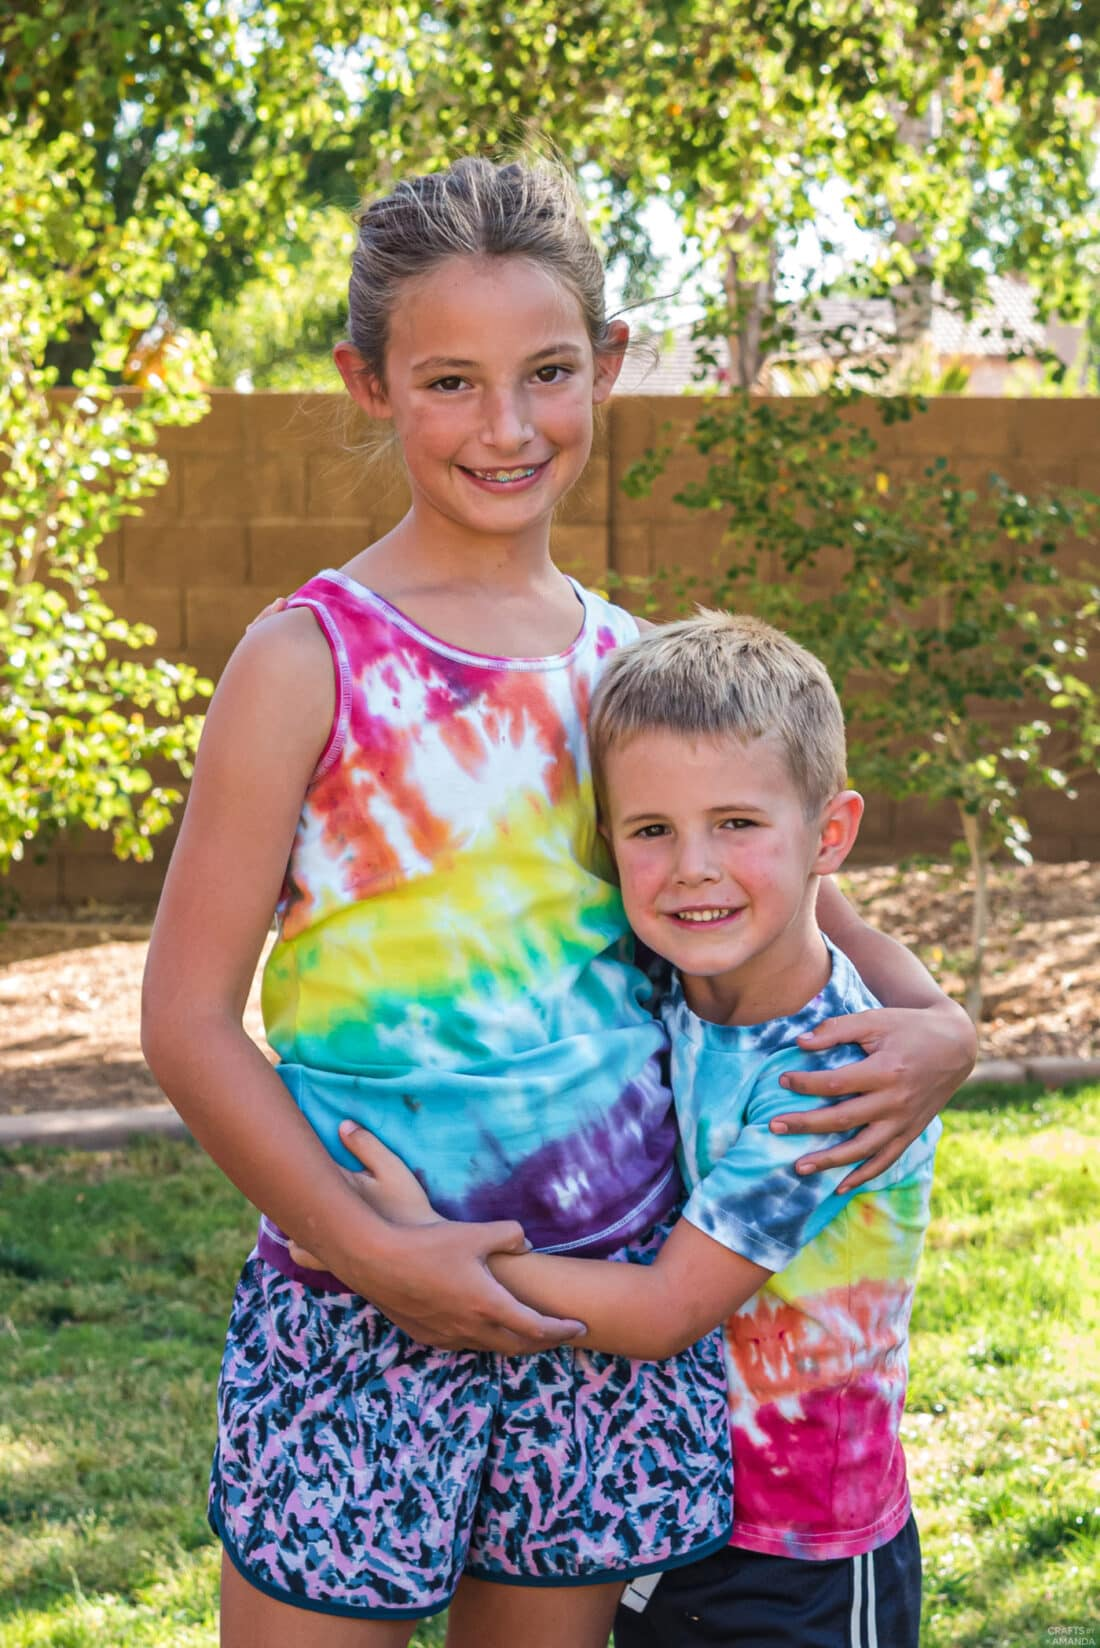 kids wearing tie dye shirts